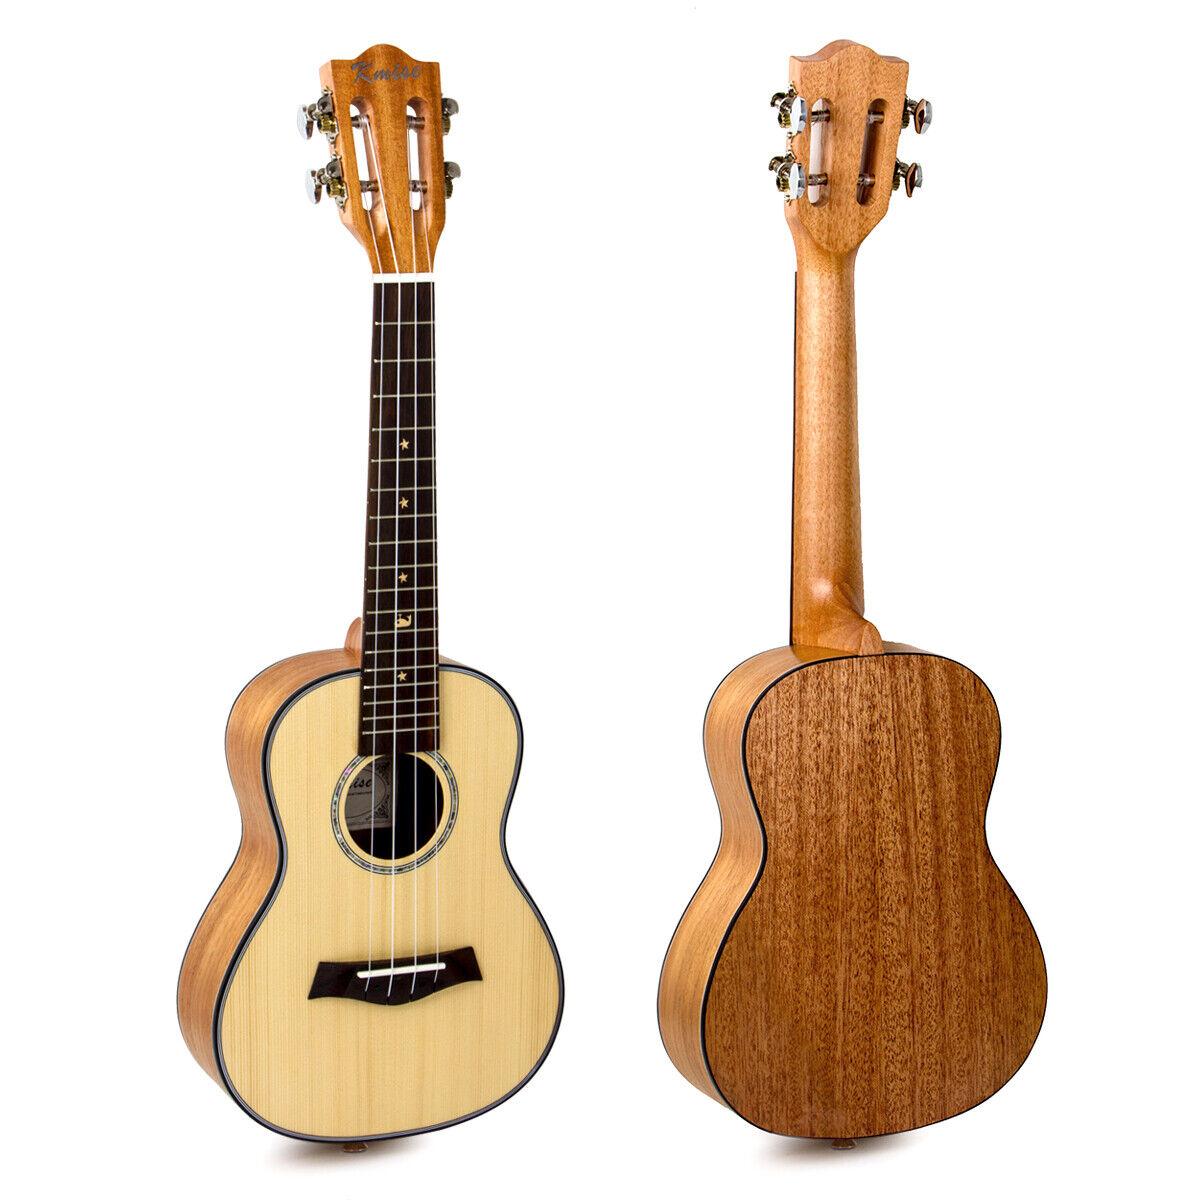 Ukulele Concert Ukelele 23 inch Classical Guitar Solid Spruce Mahogany for Gift